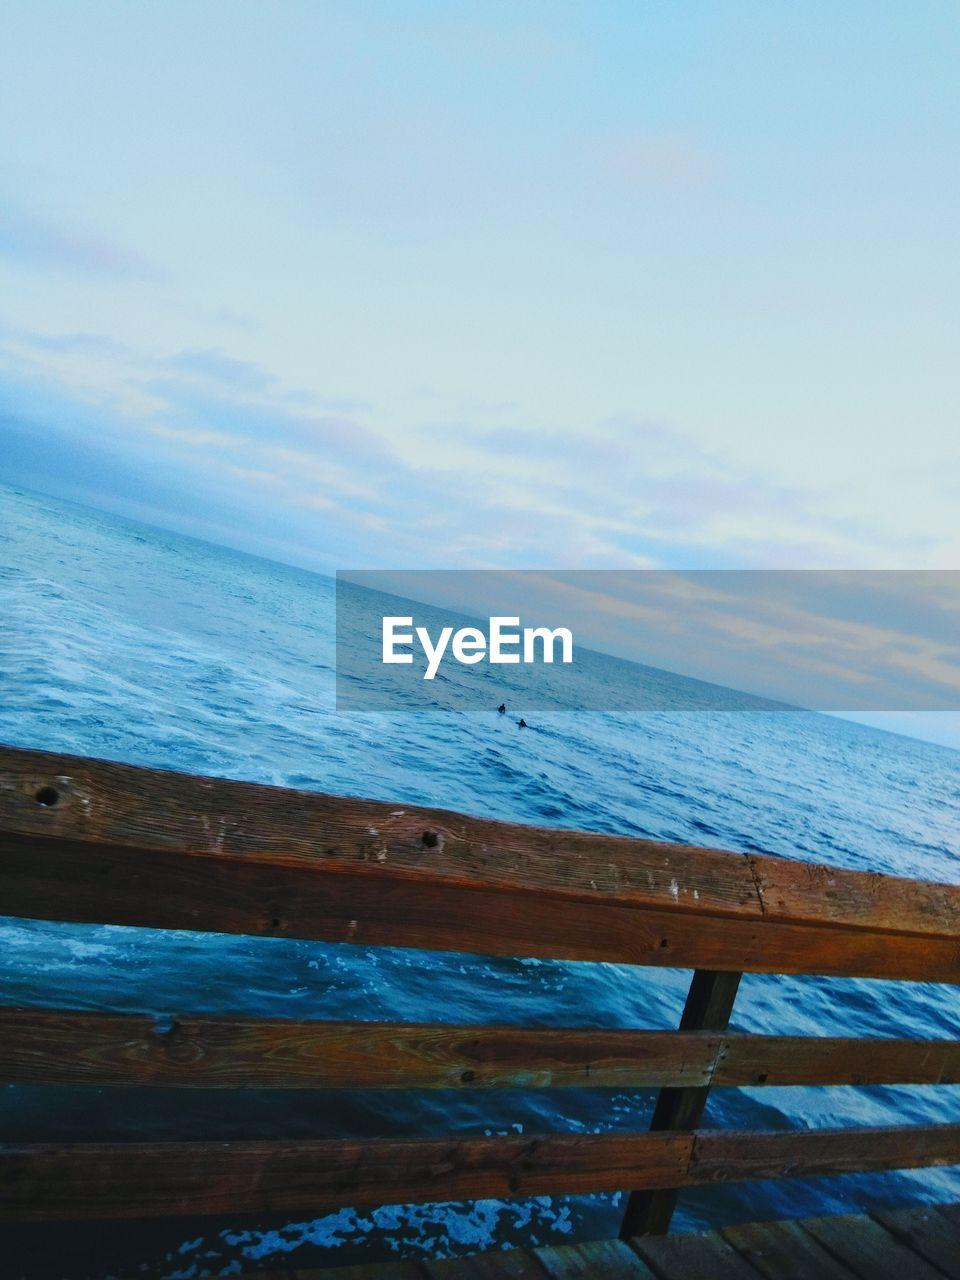 sea, water, horizon, sky, horizon over water, wood - material, beach, land, scenics - nature, beauty in nature, nature, tranquil scene, tranquility, cloud - sky, outdoors, no people, wood, railing, barrier